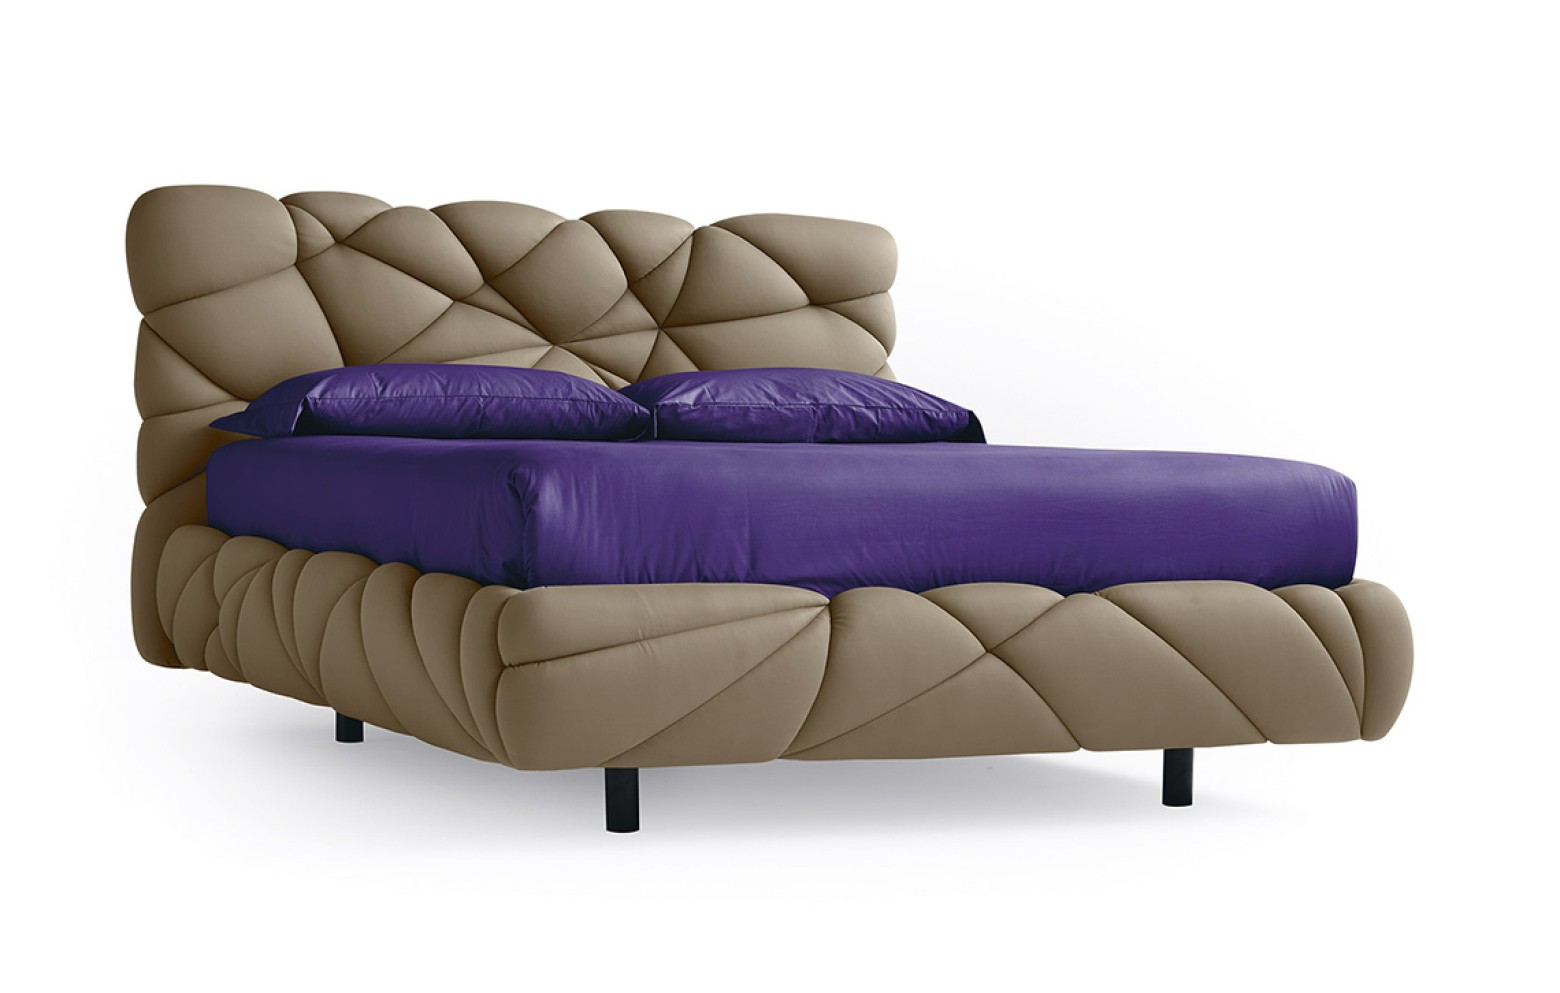 marvin betten betten schr nke who 39 s perfect. Black Bedroom Furniture Sets. Home Design Ideas